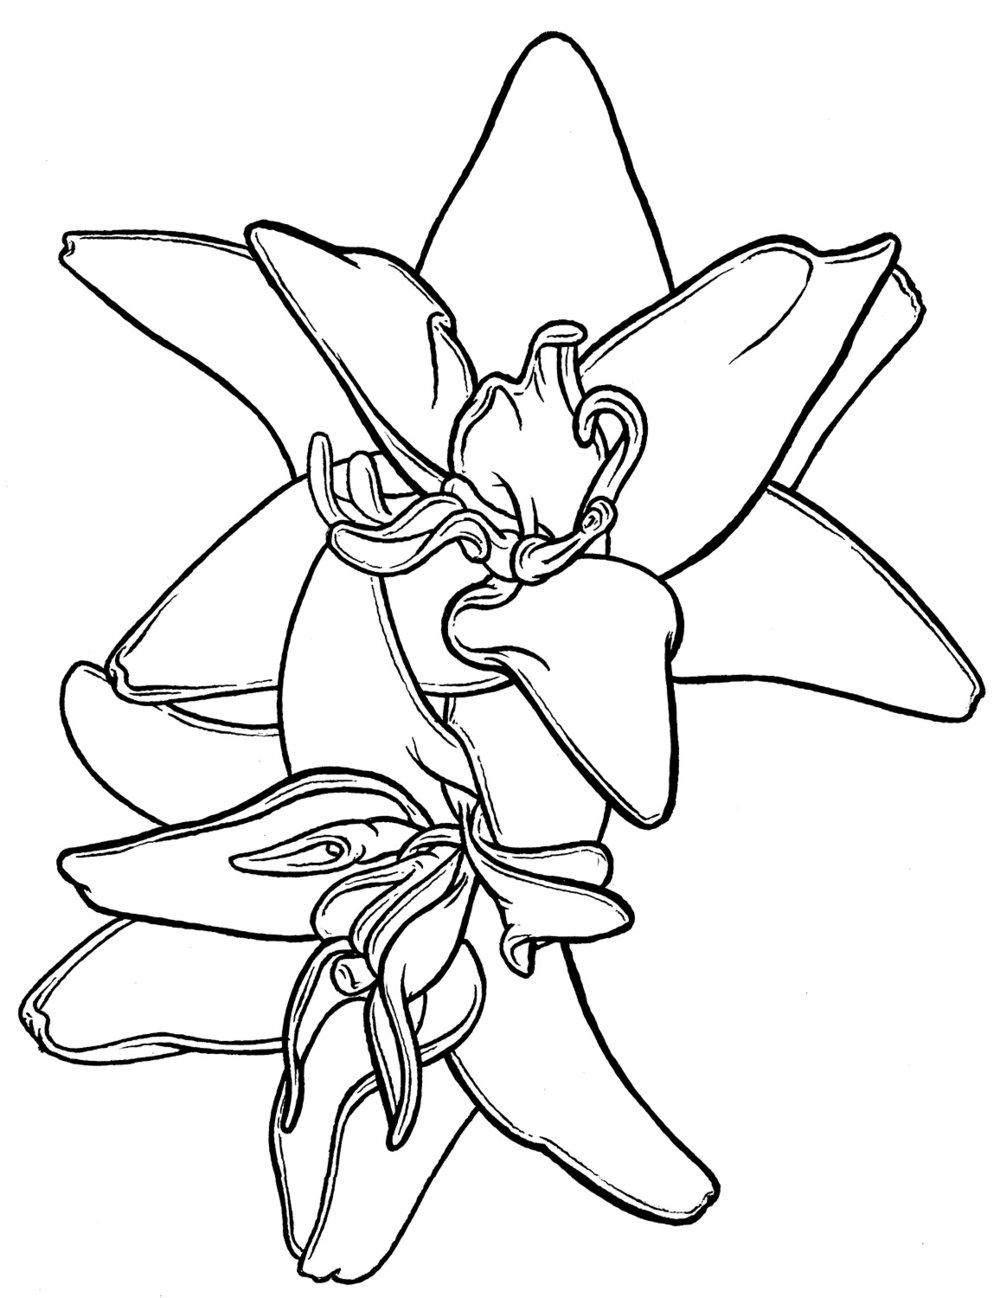 2orchids-web.jpg